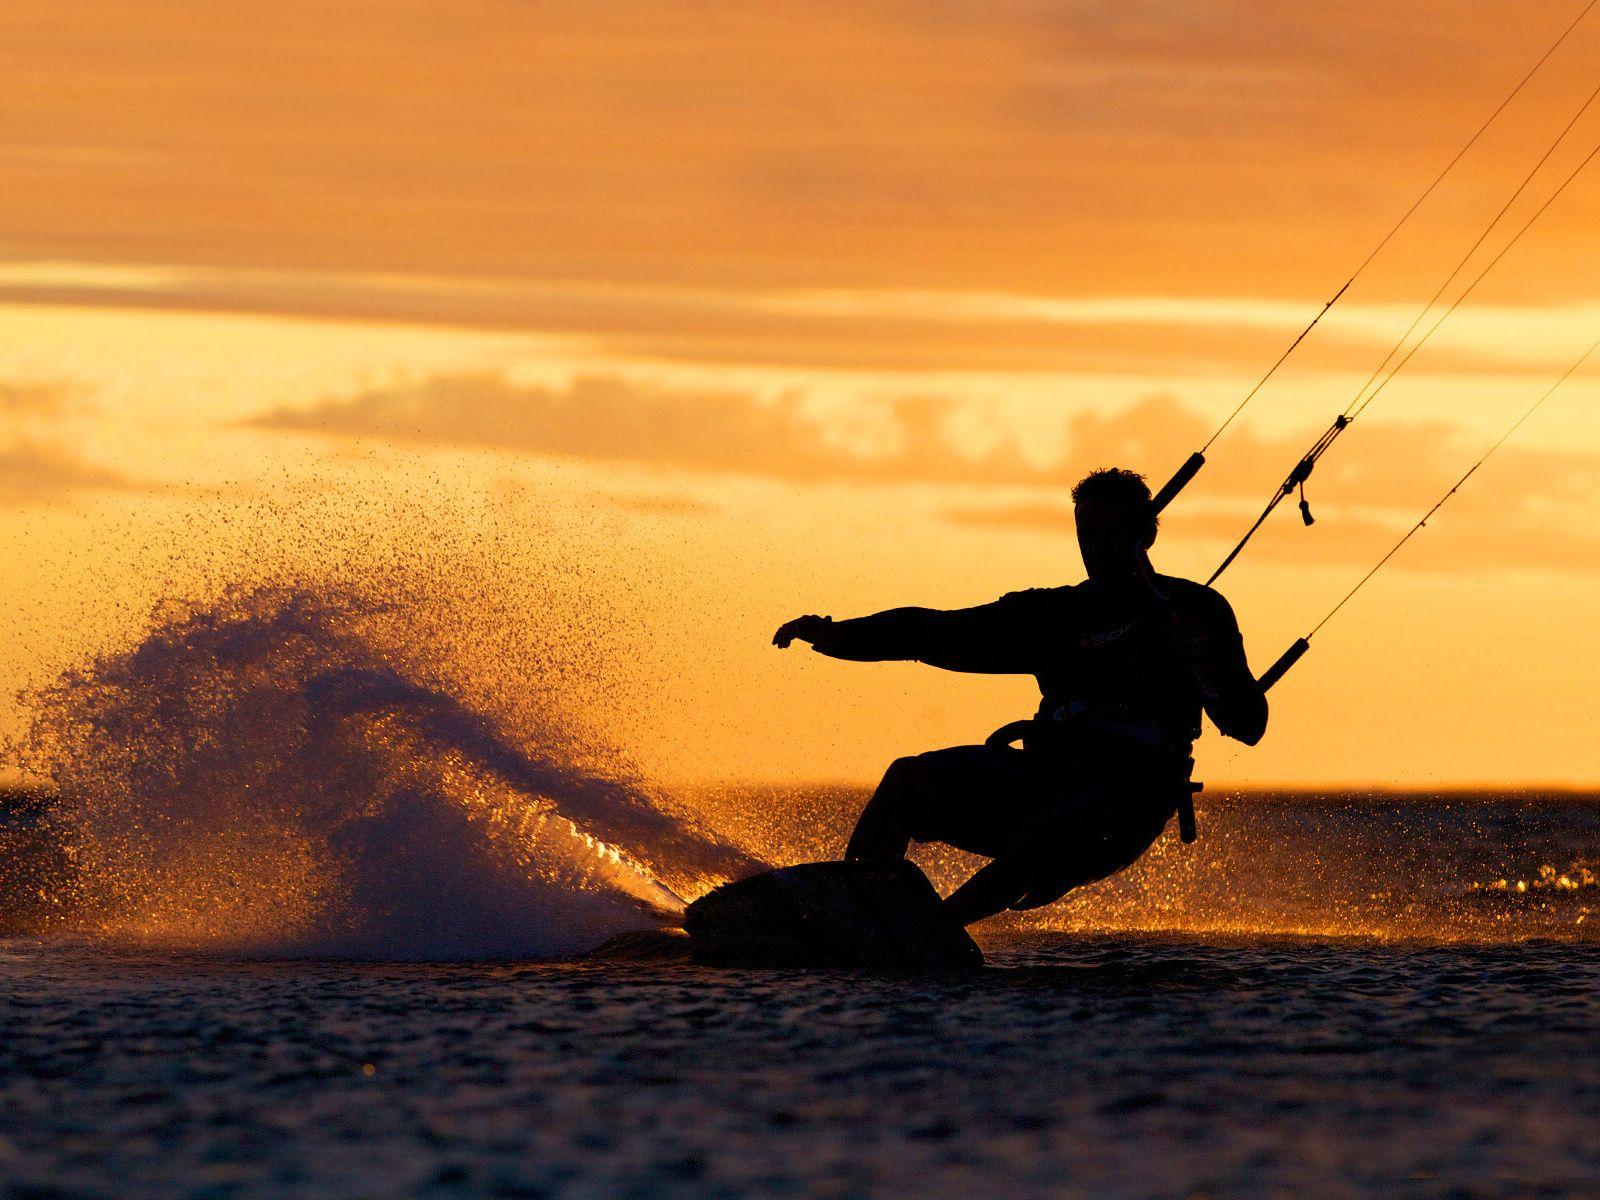 Kitesurfing wallpaper